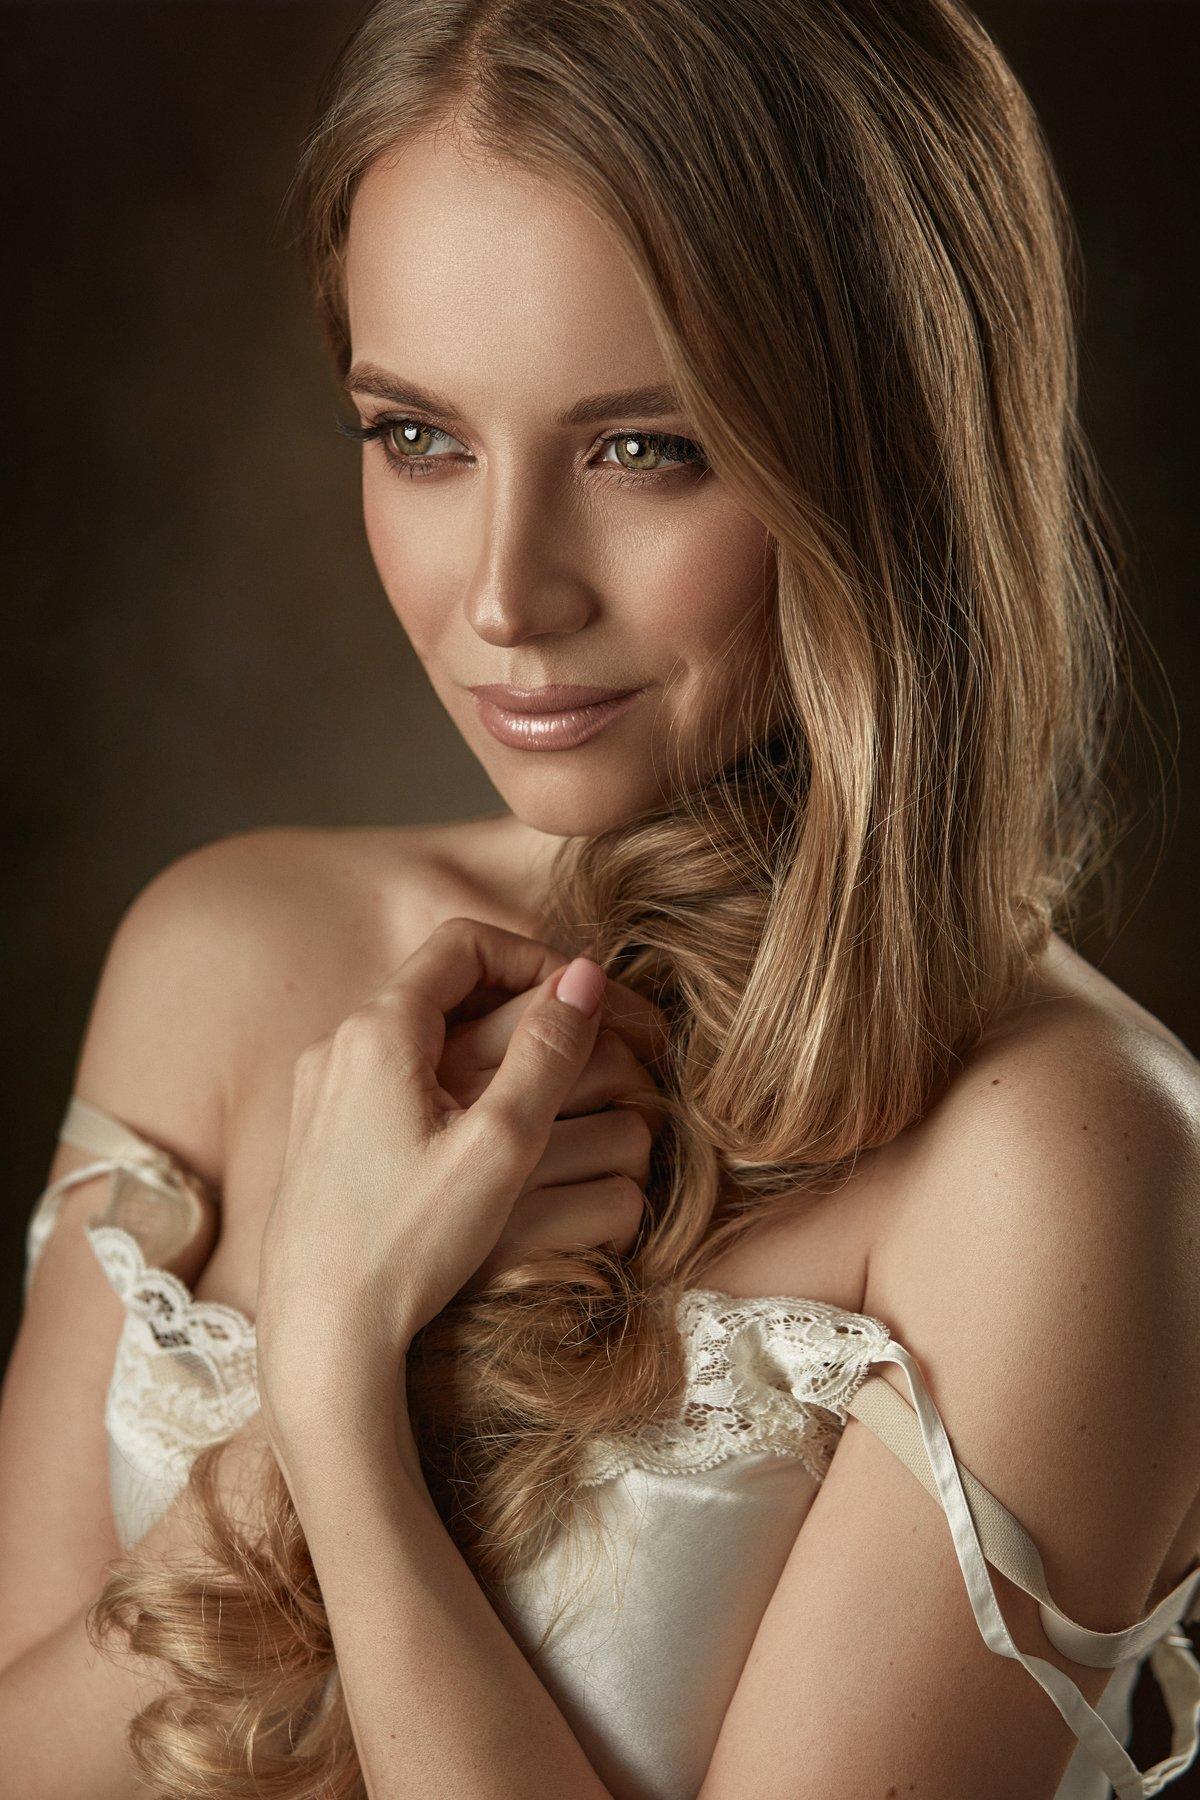 #womanportrait #models #girl #beauty #retauch #portrait #captureone, Ковалёв Иван